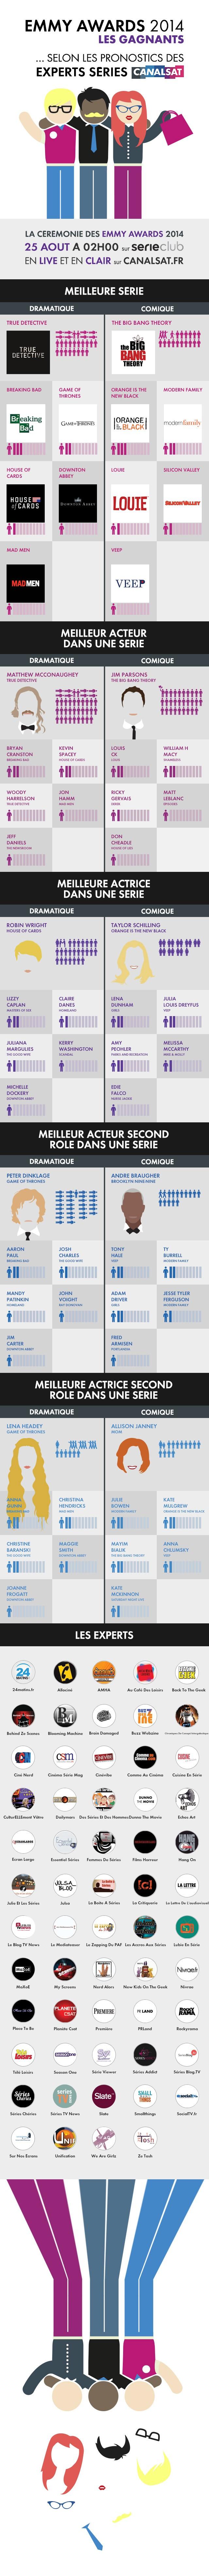 Emmy Awards 2014 - infographie